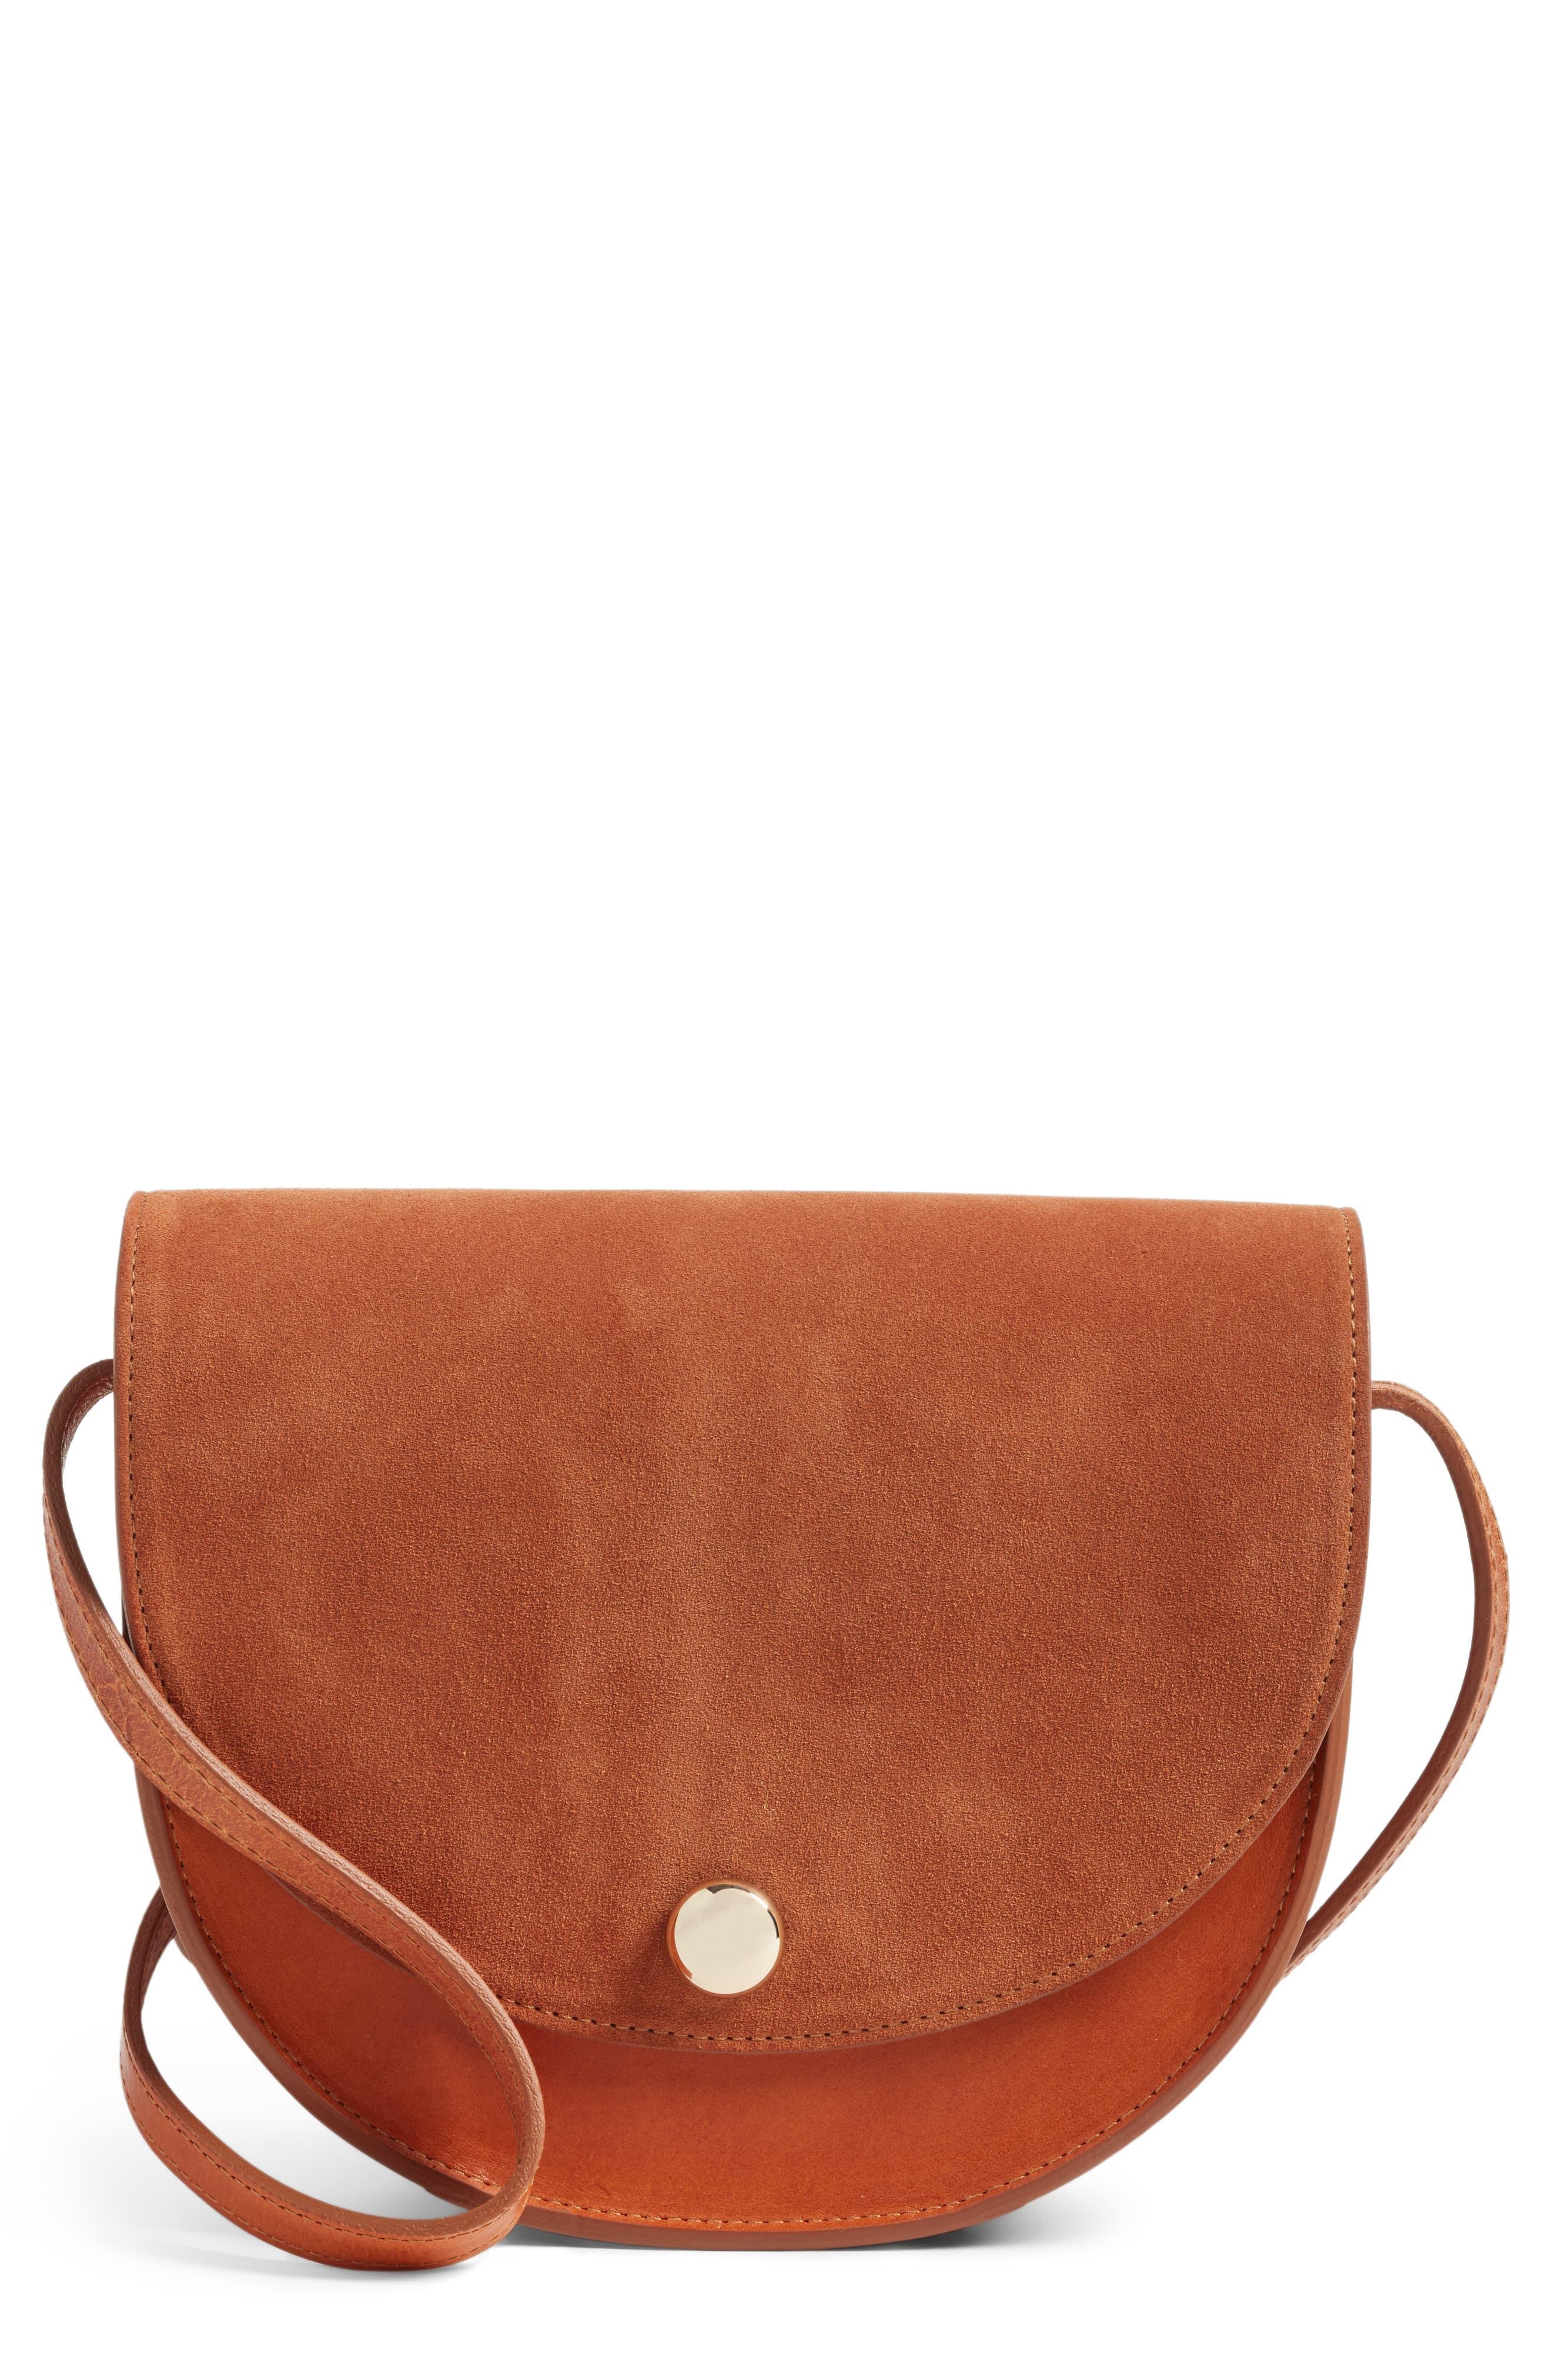 Ernest Crossbody Bag,                             Main thumbnail 1, color,                             Bi Fabric Camel